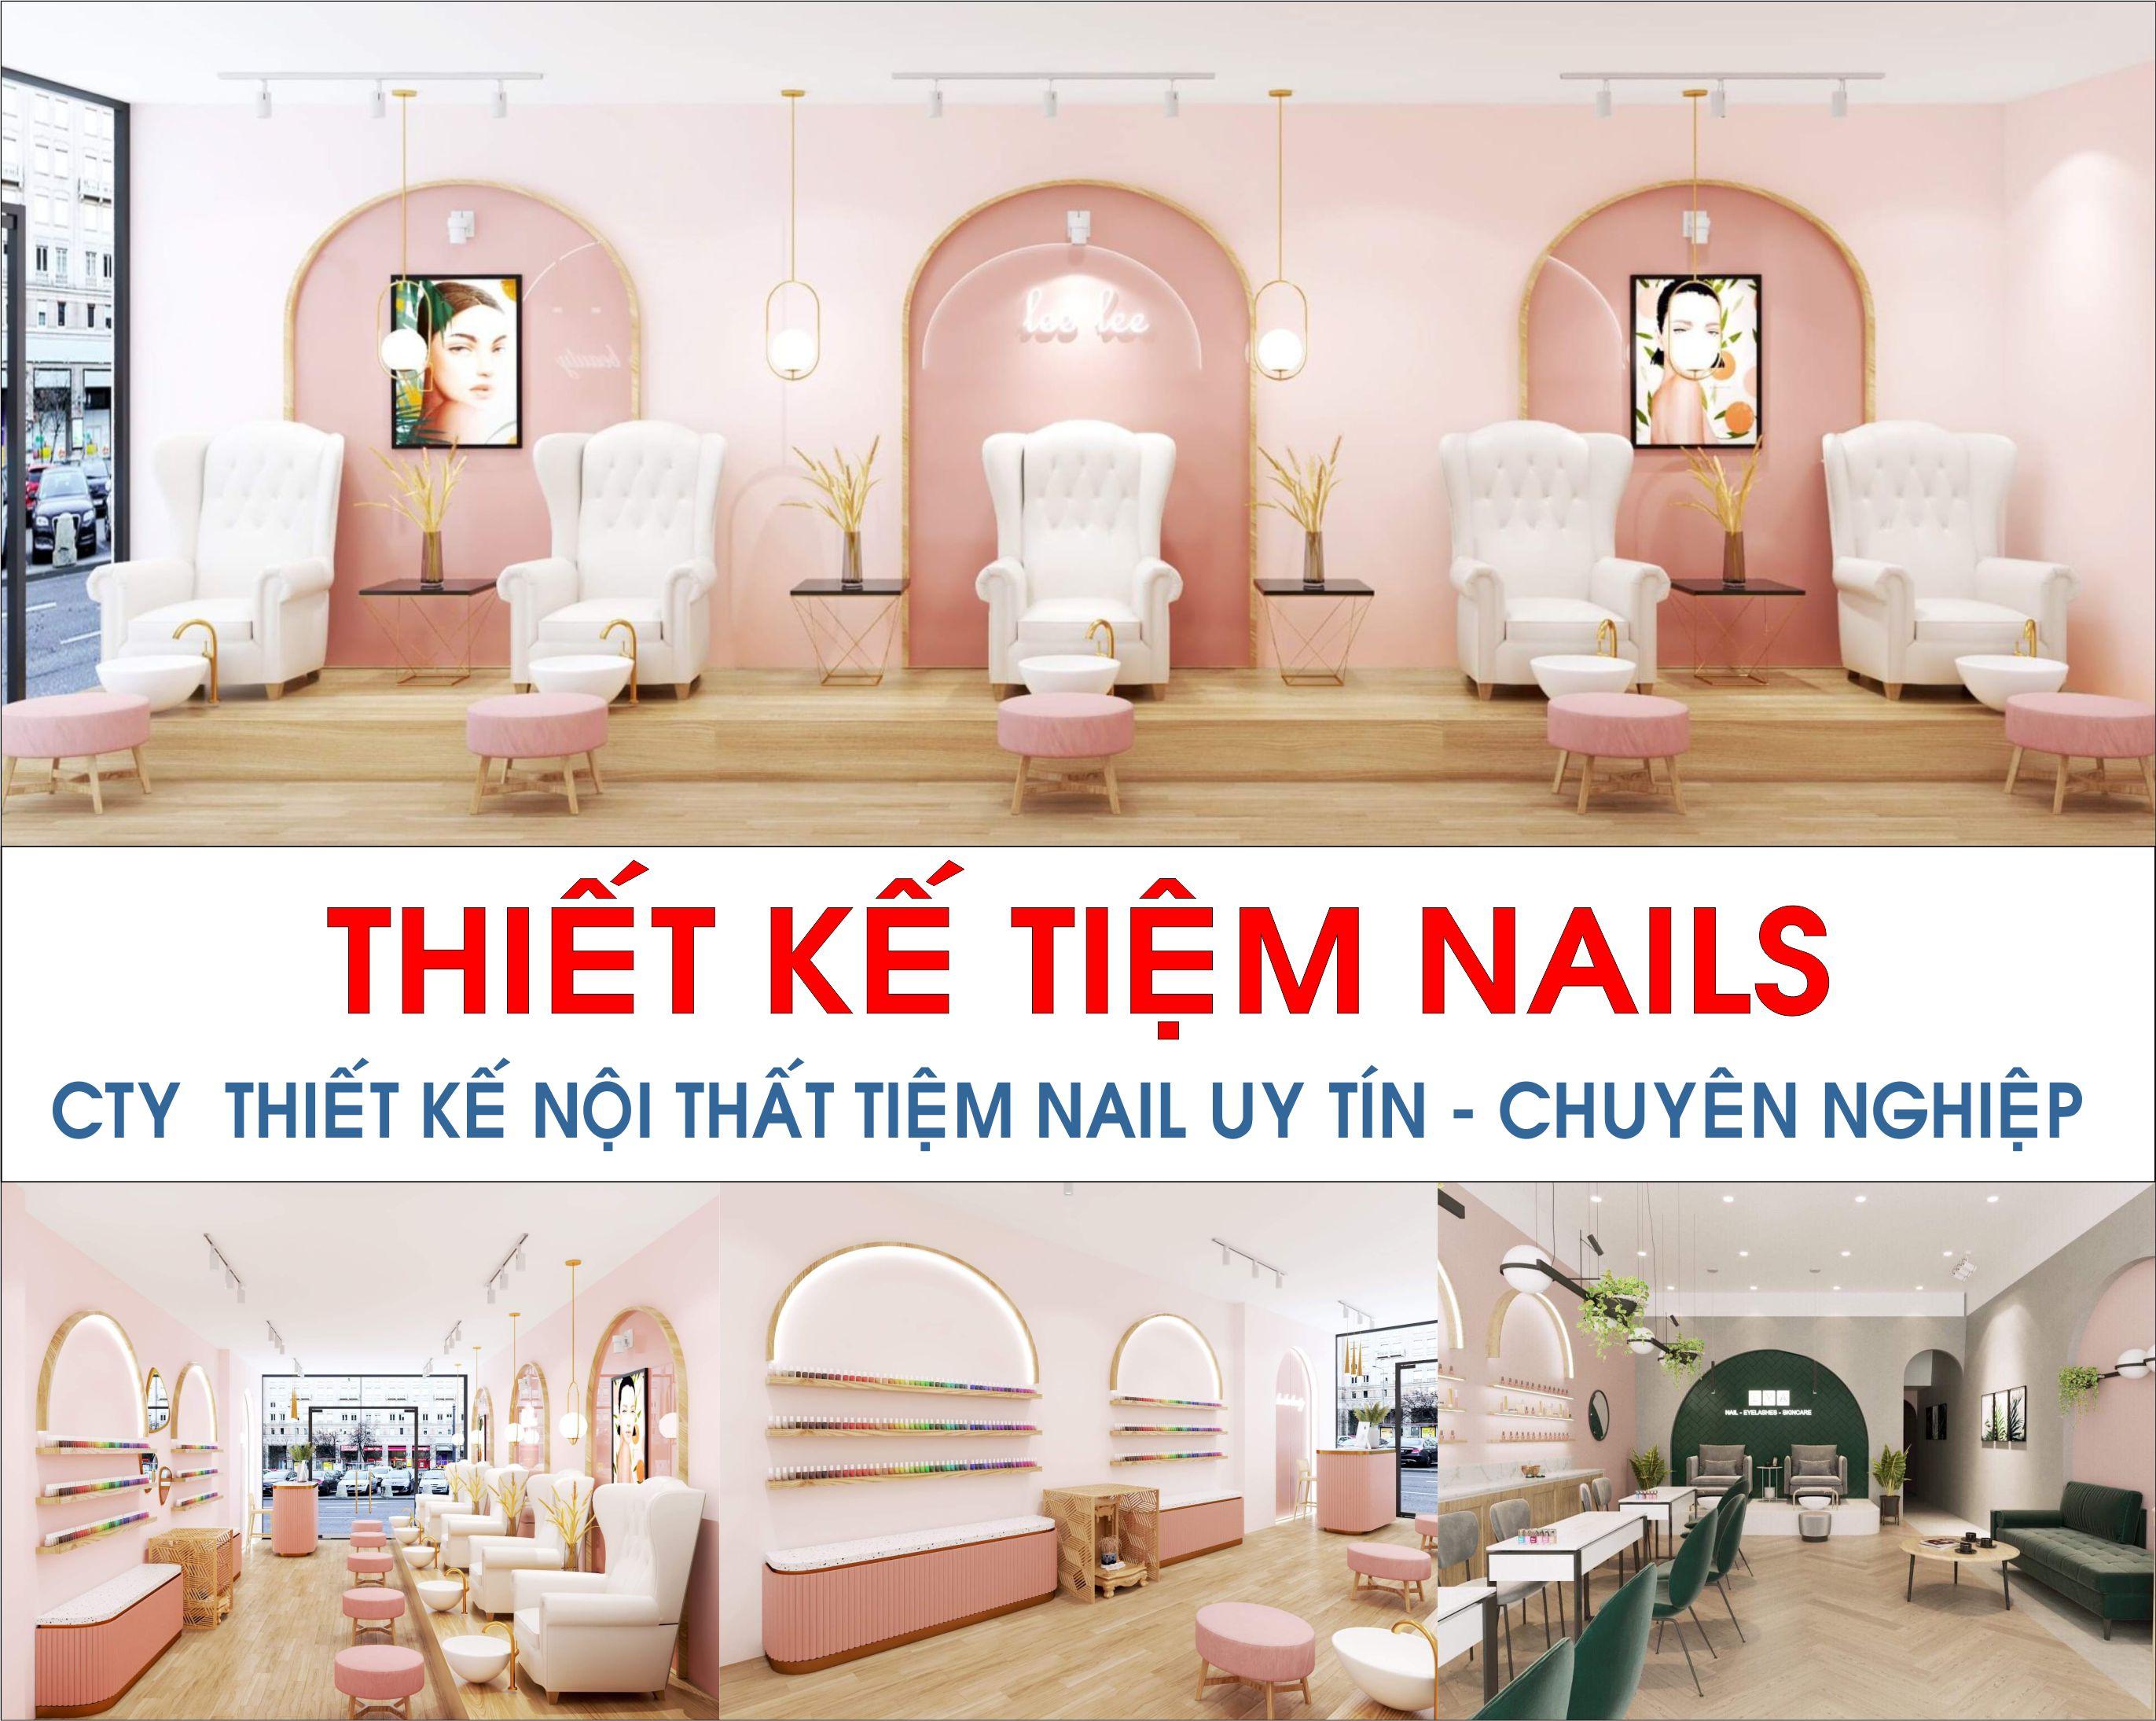 cong-ty-thiet-ke-tiem-nail-dep-chuyen-nghiep